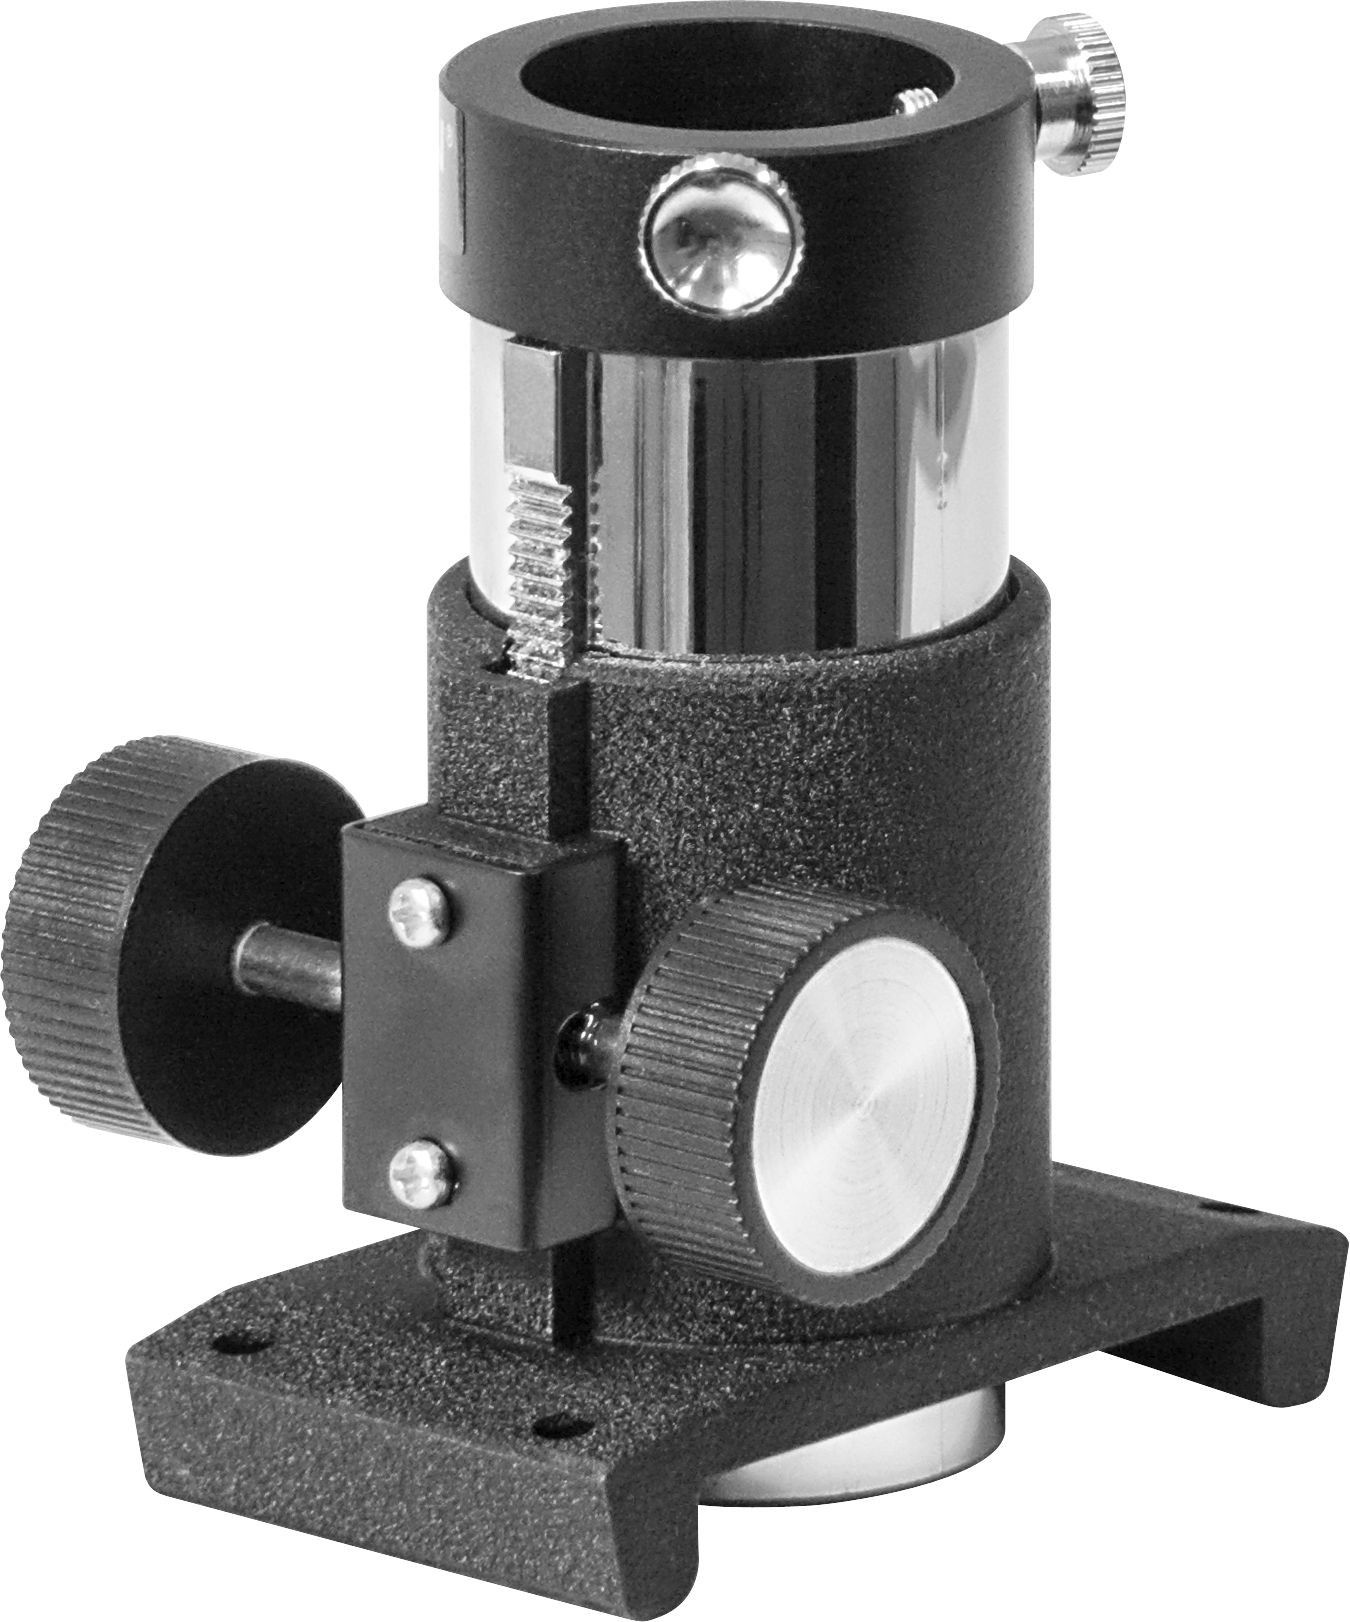 Orion Basic 1.25in Rack & Pinion Focuser